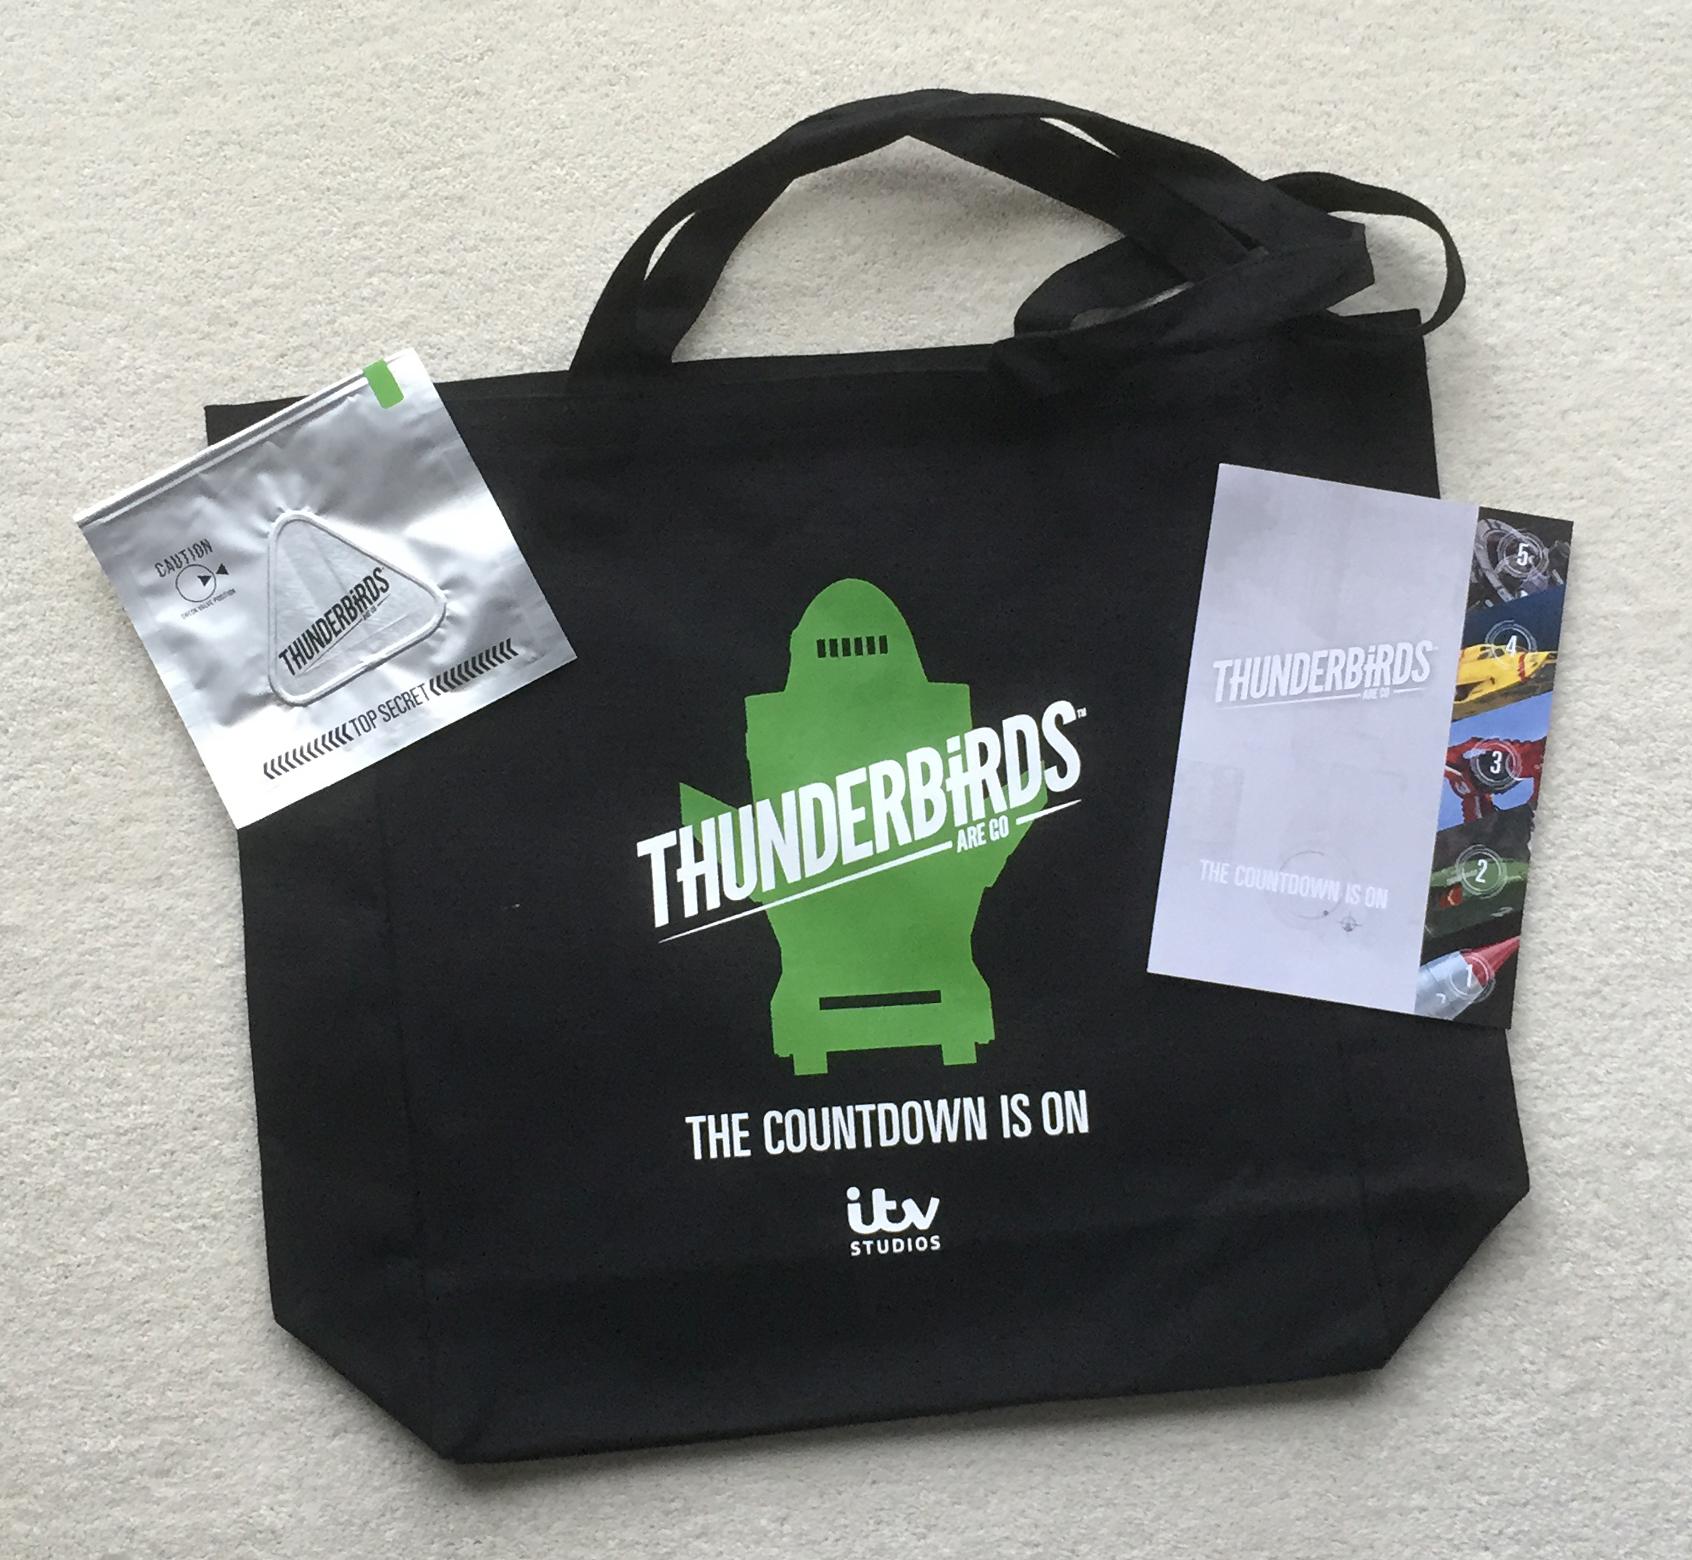 Thunderbird 2 bag